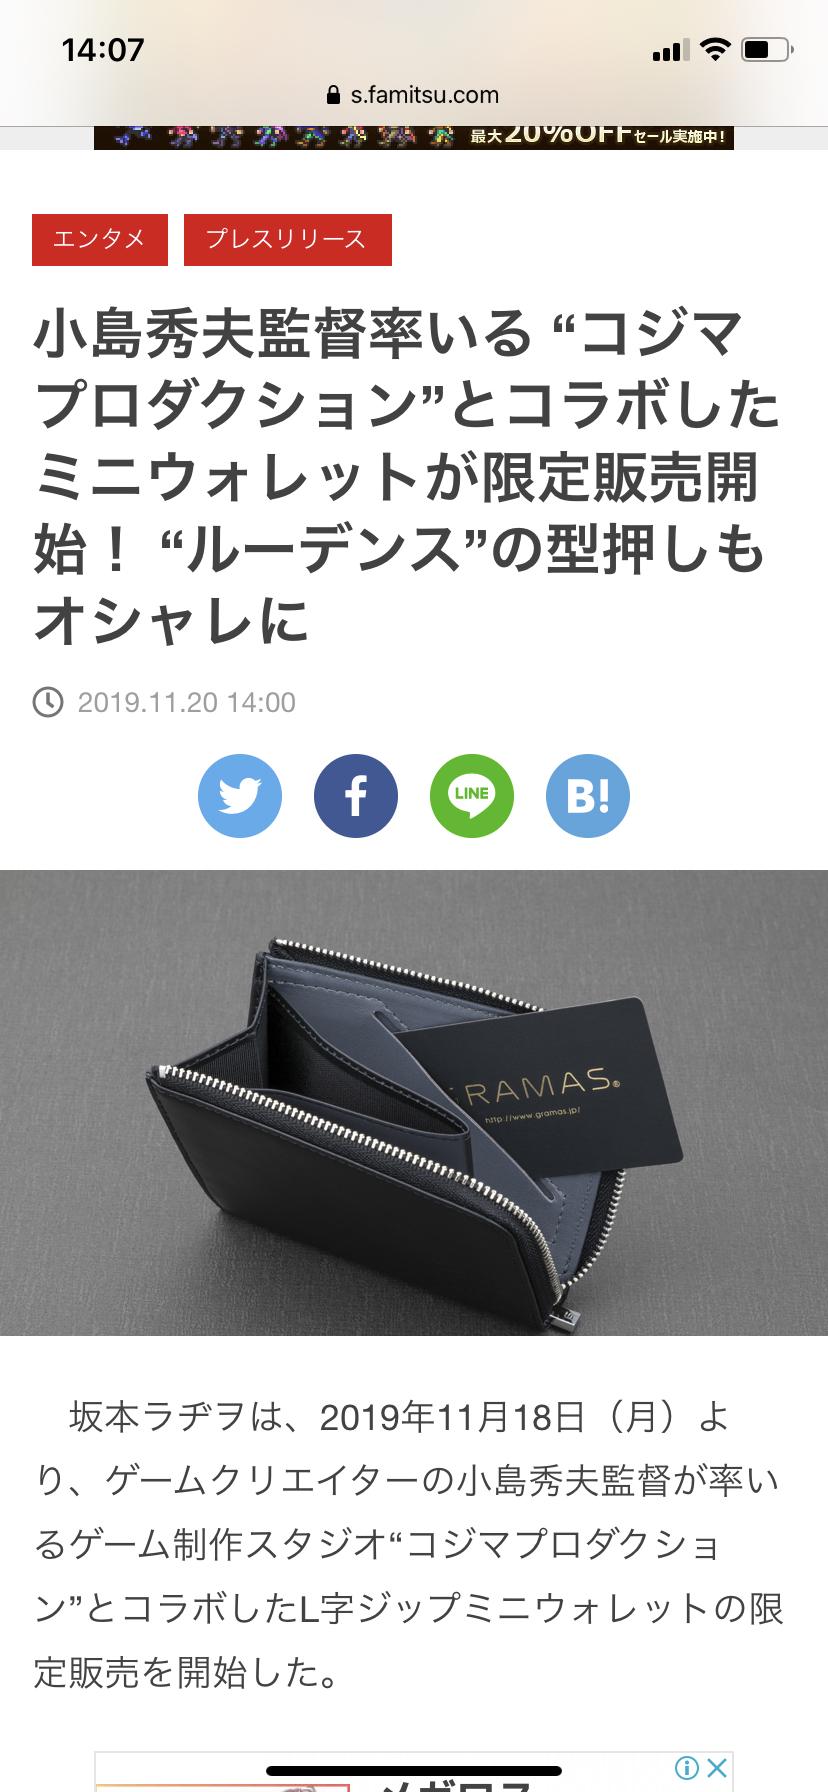 fvN4Pbp - 【朗報】小島秀夫が財布を販売!